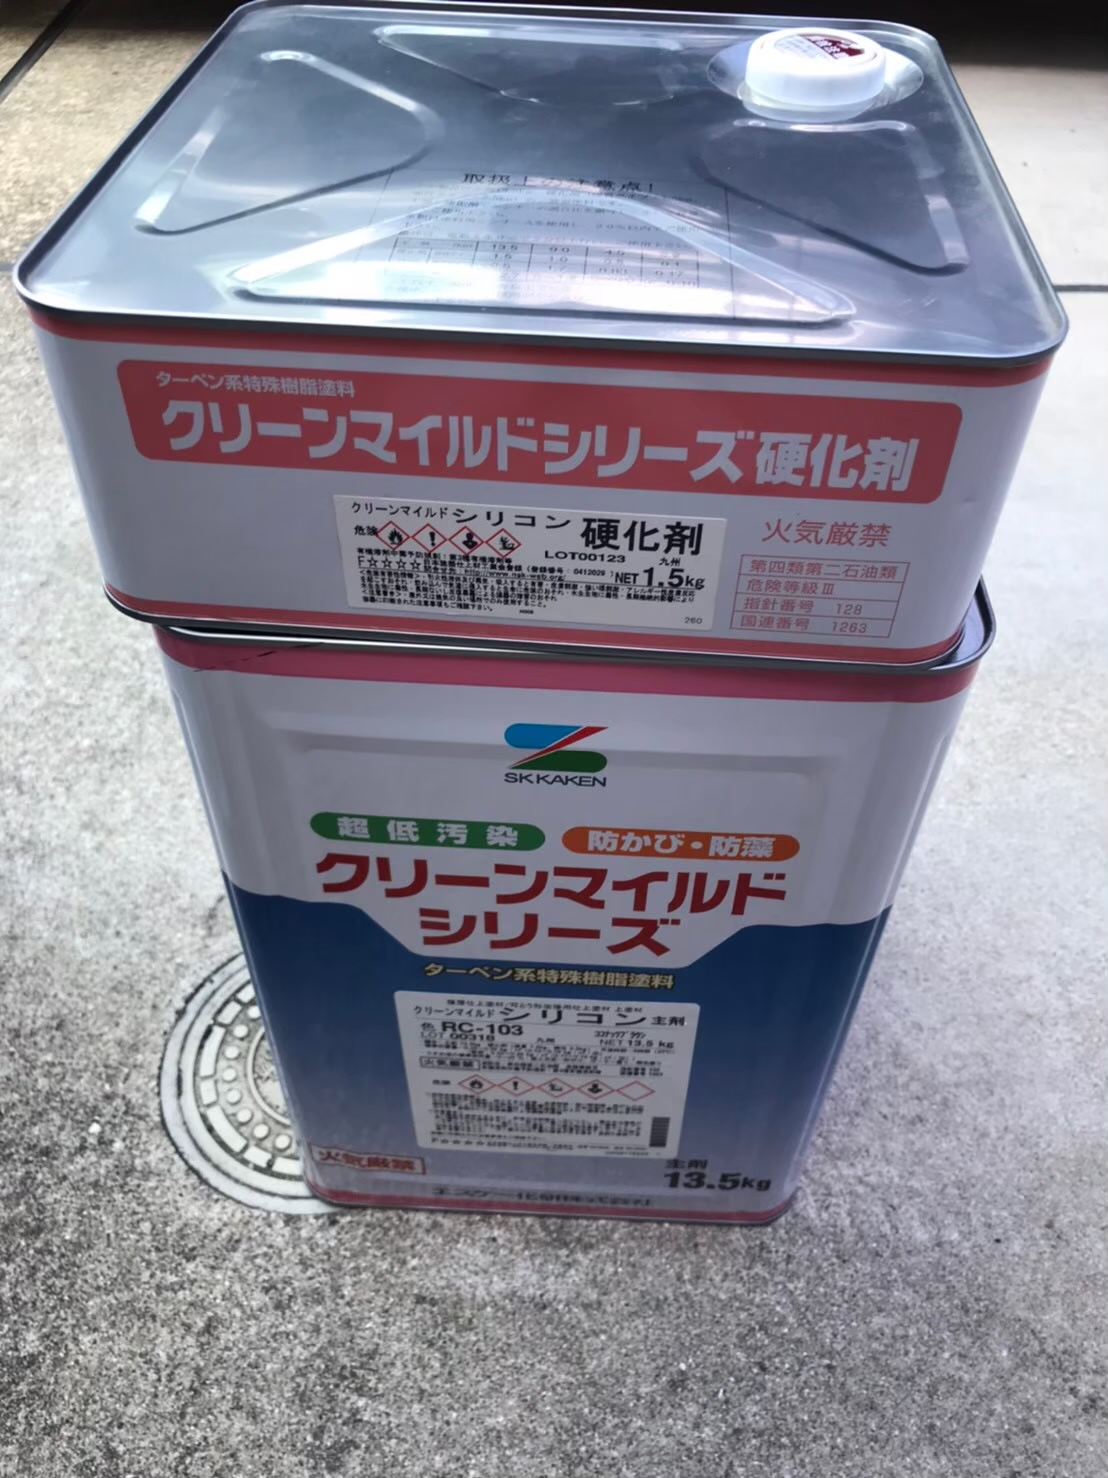 SK化研のクリーンマイルドシリコン